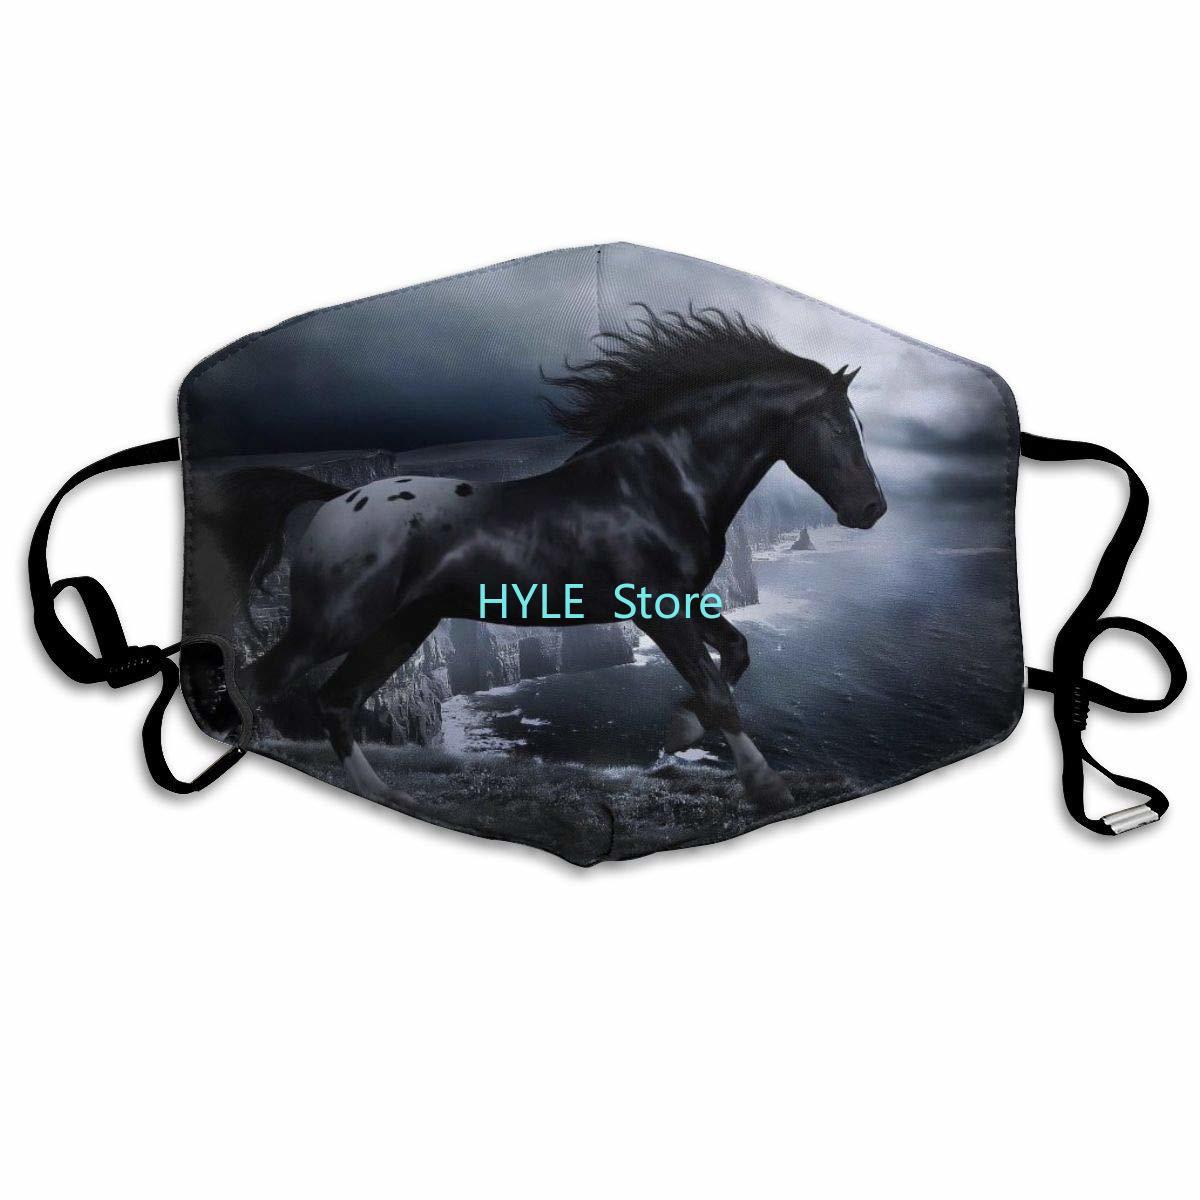 Cool Black Horse Anti Dust Half Face Mask Fashion Reusable Washable Breathable Mask Adjustable Elastic Earloop For Adults Kids